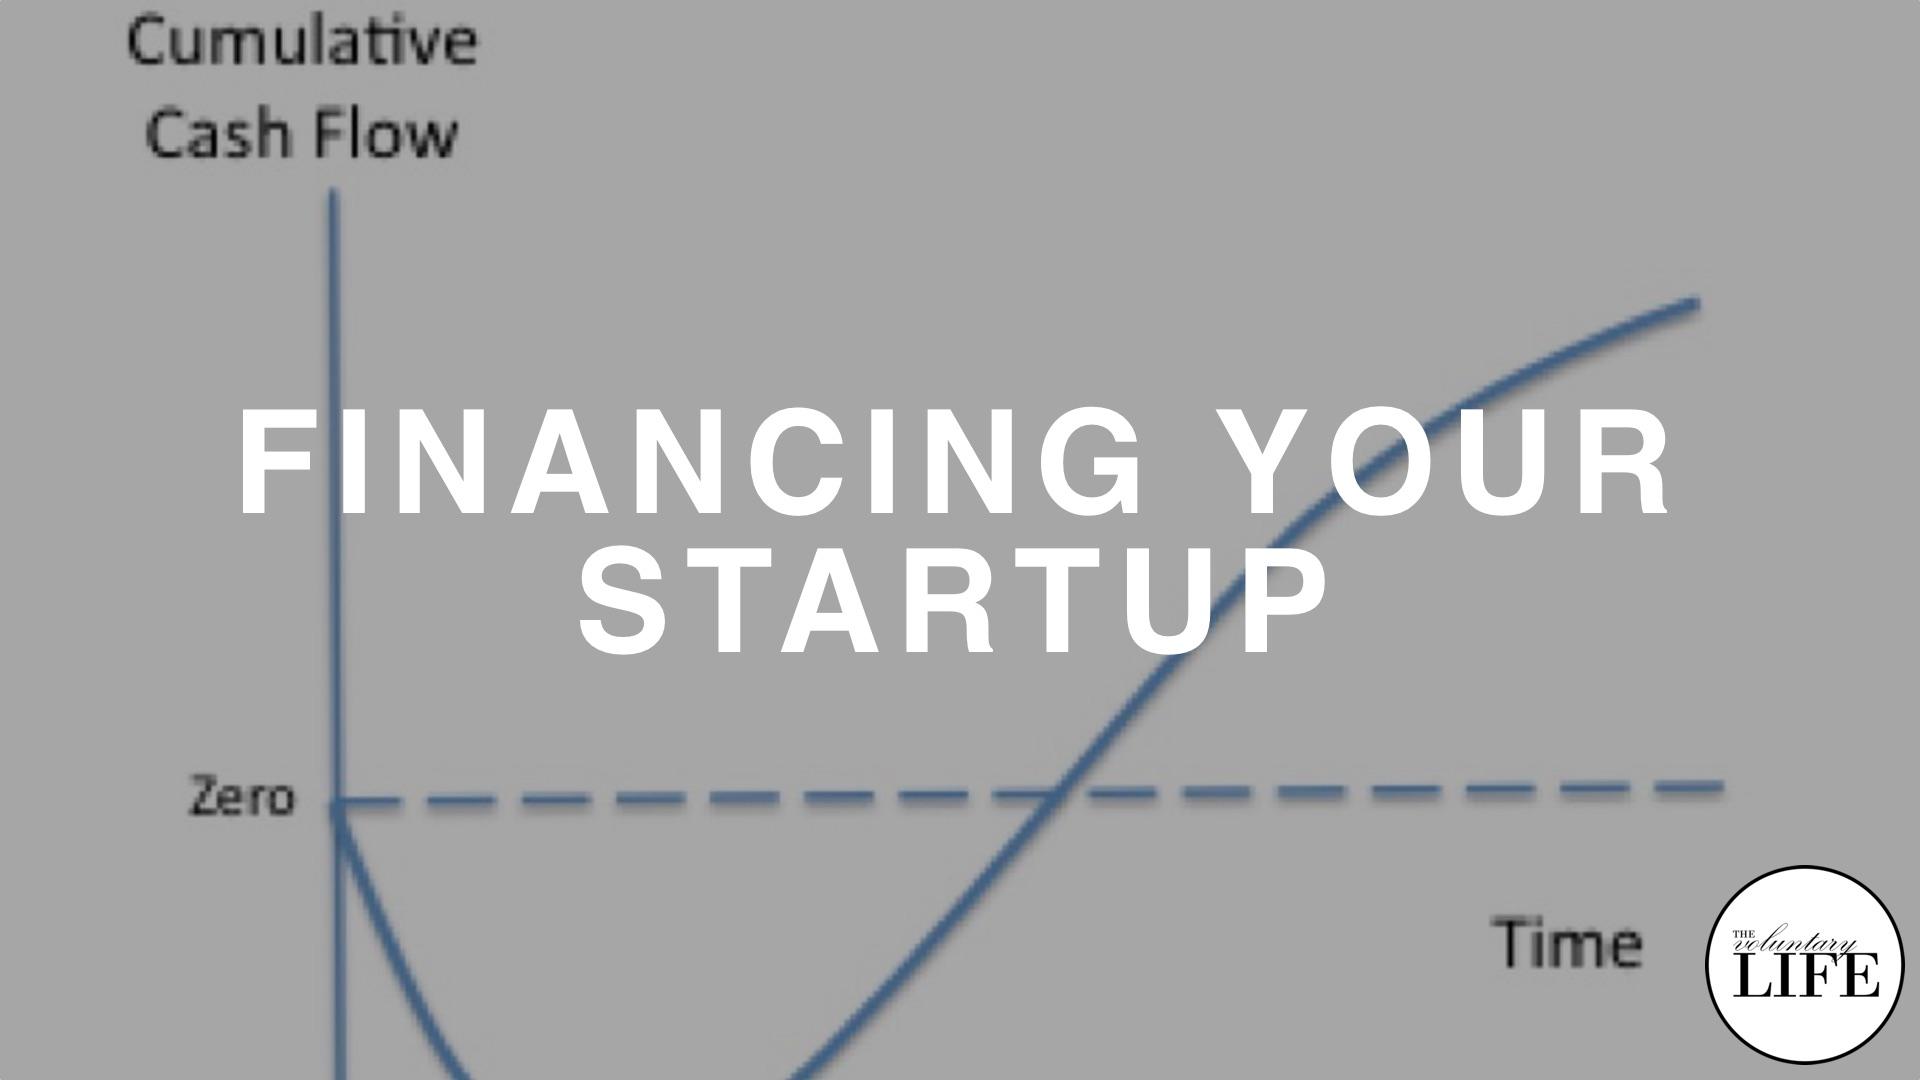 55 Entrepreneurship Part 9: Financing Your Startup